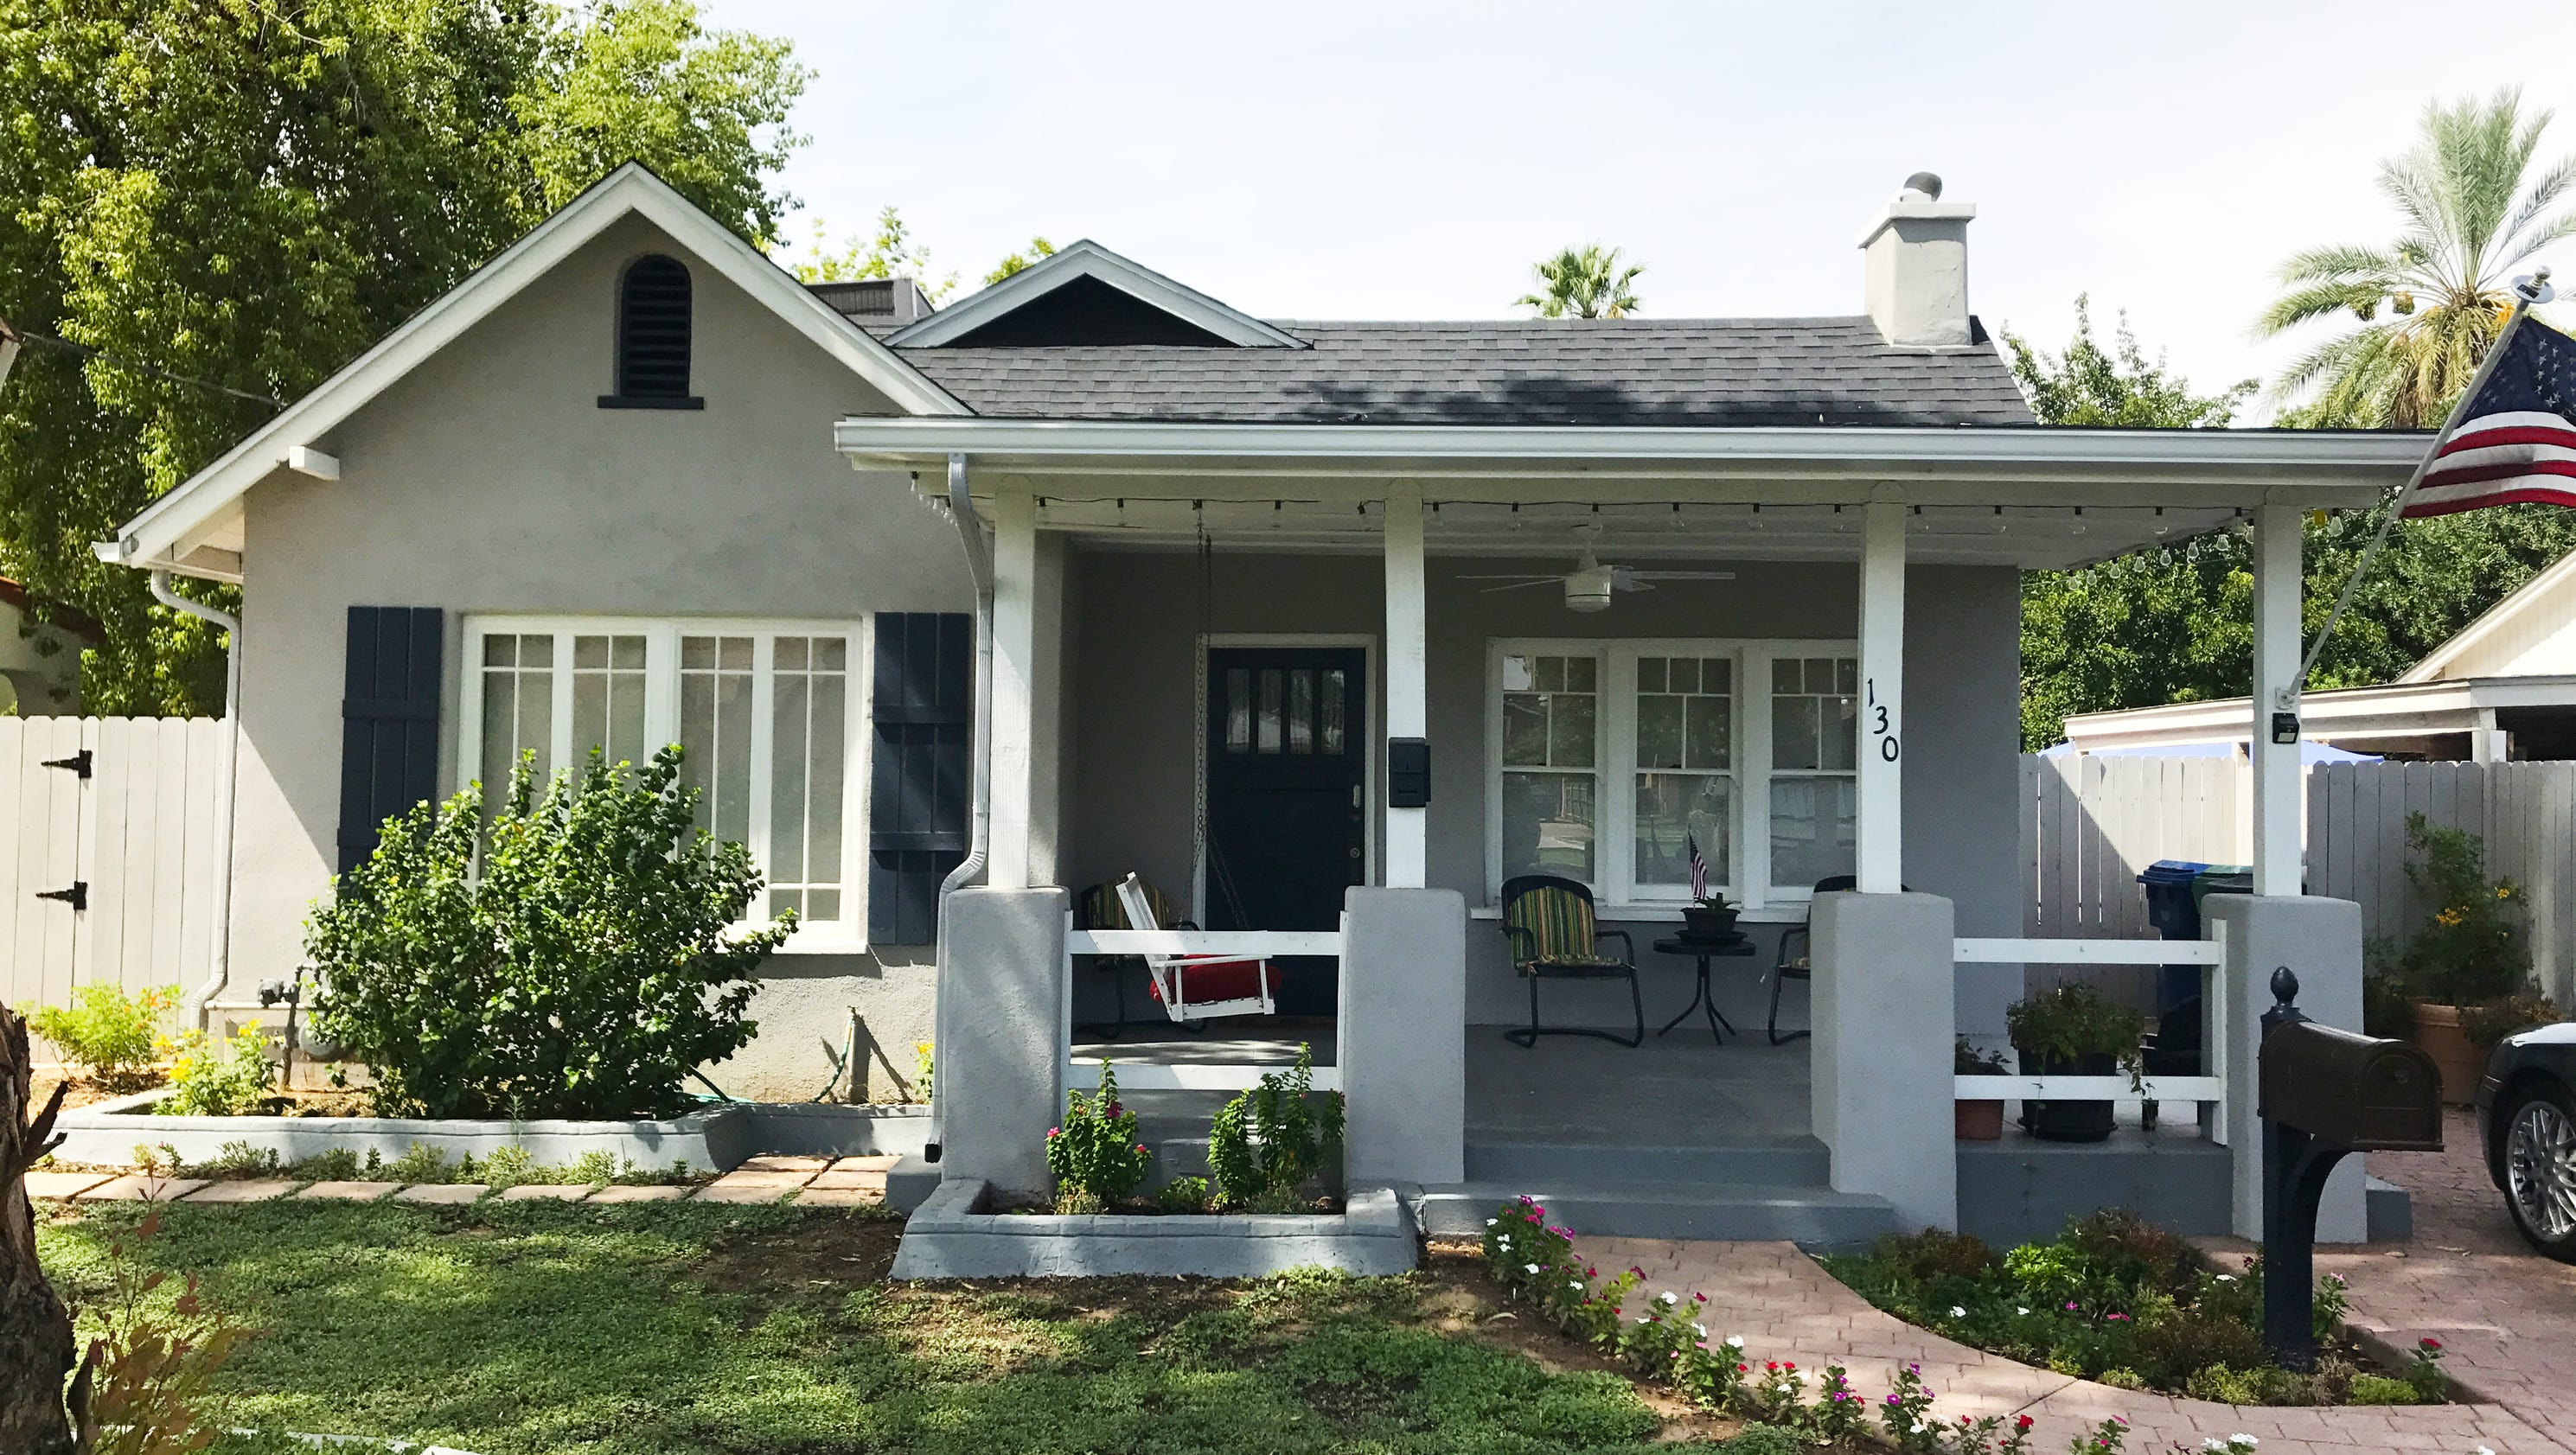 Trump tax plan draws ire but may boost metro Phoenixs housing market